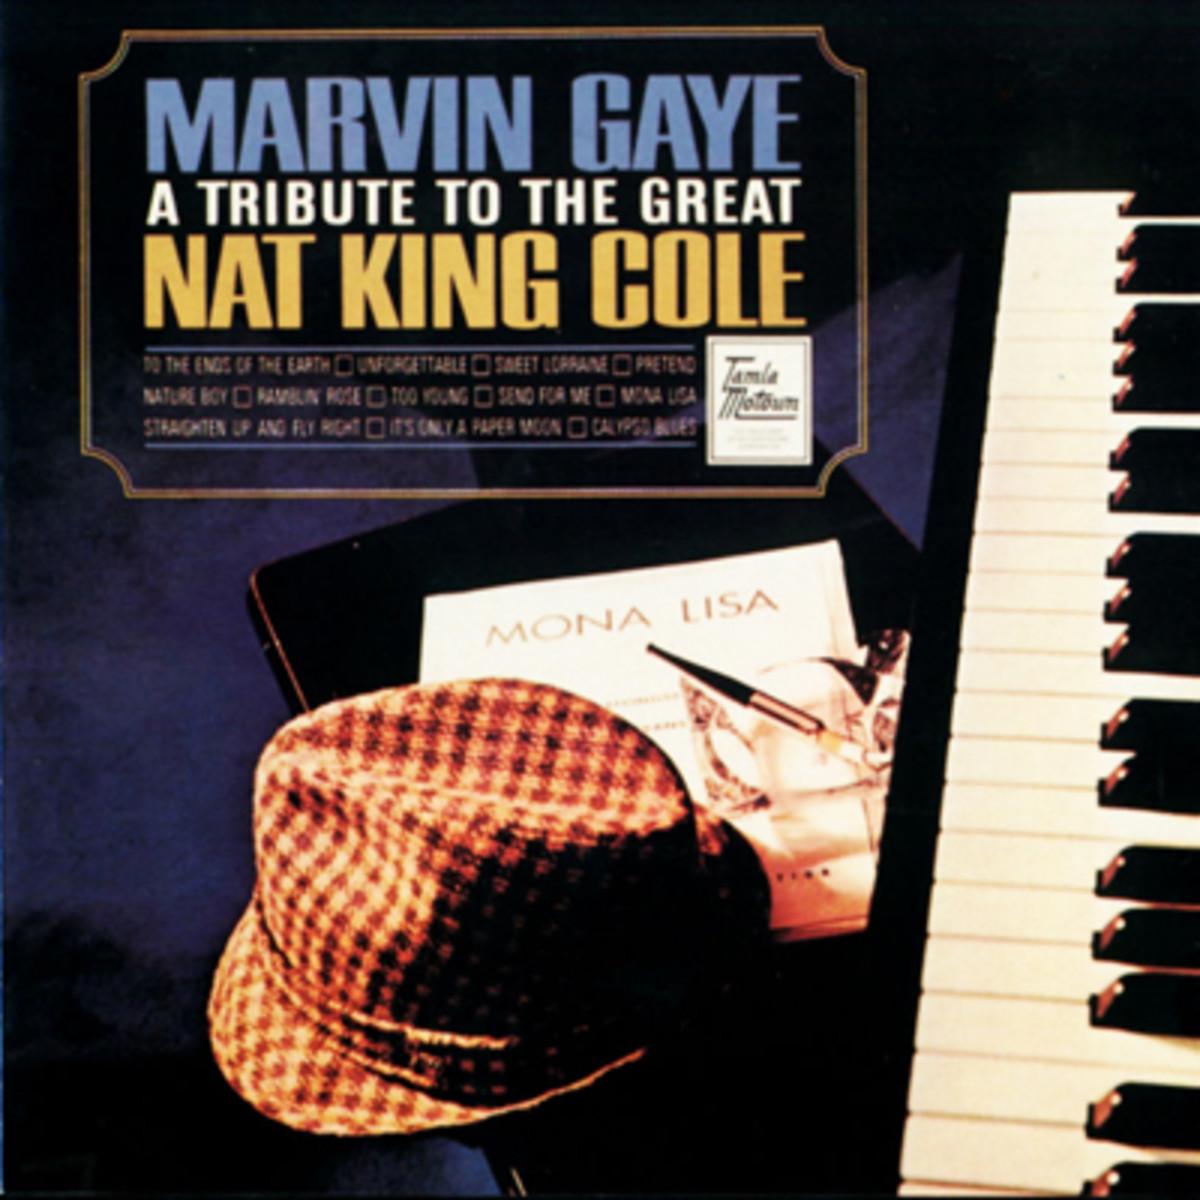 Gaye_King_Cole_tribute_album